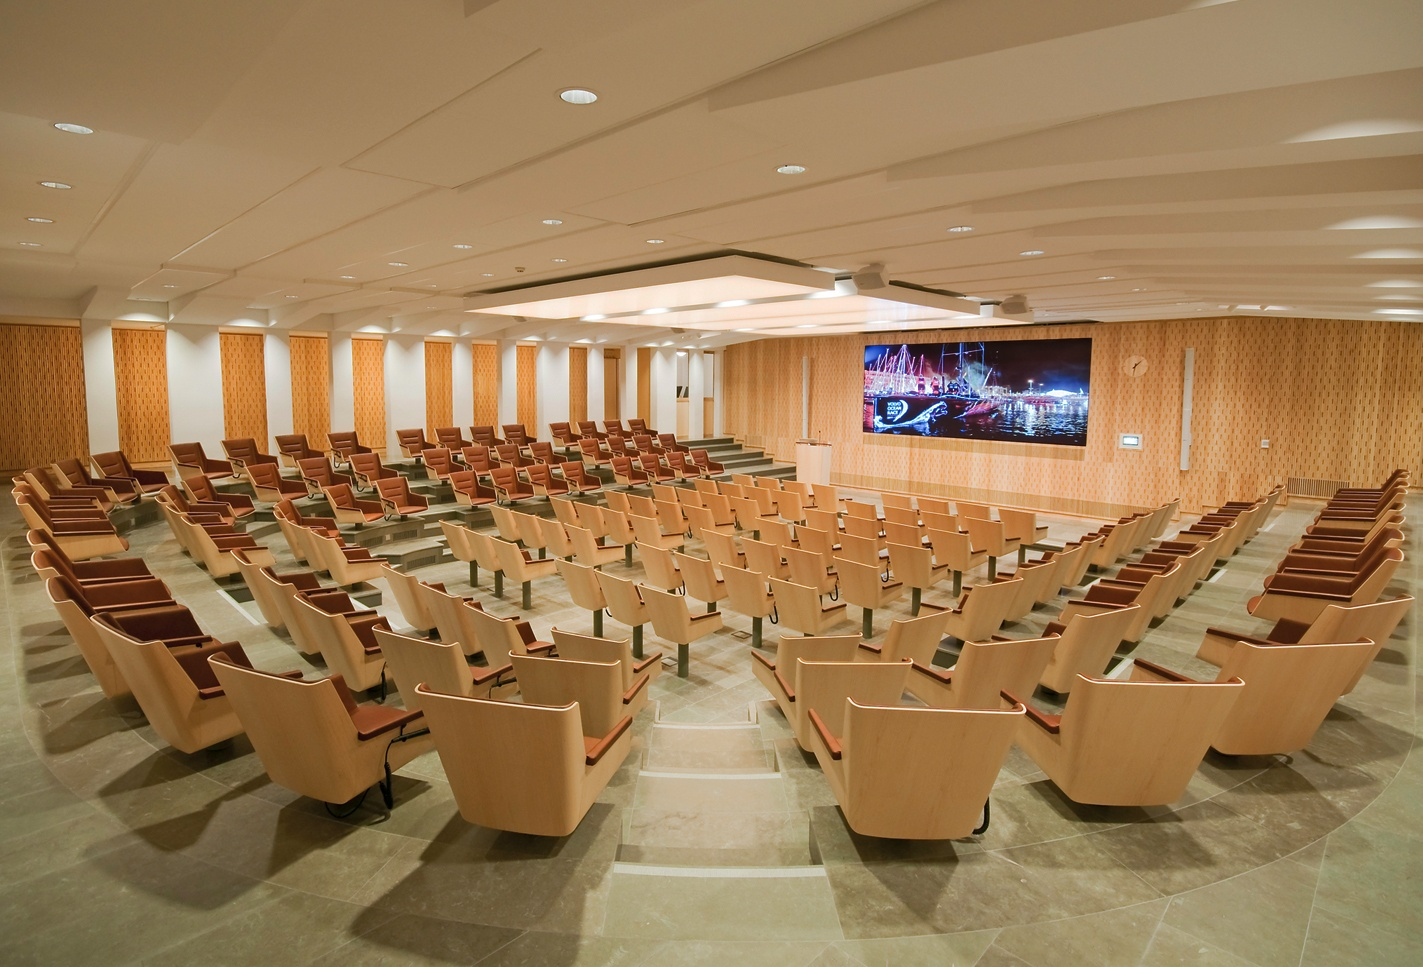 Prysm LPD Selected as AV Centerpiece for the Wallenberg Auditorium.